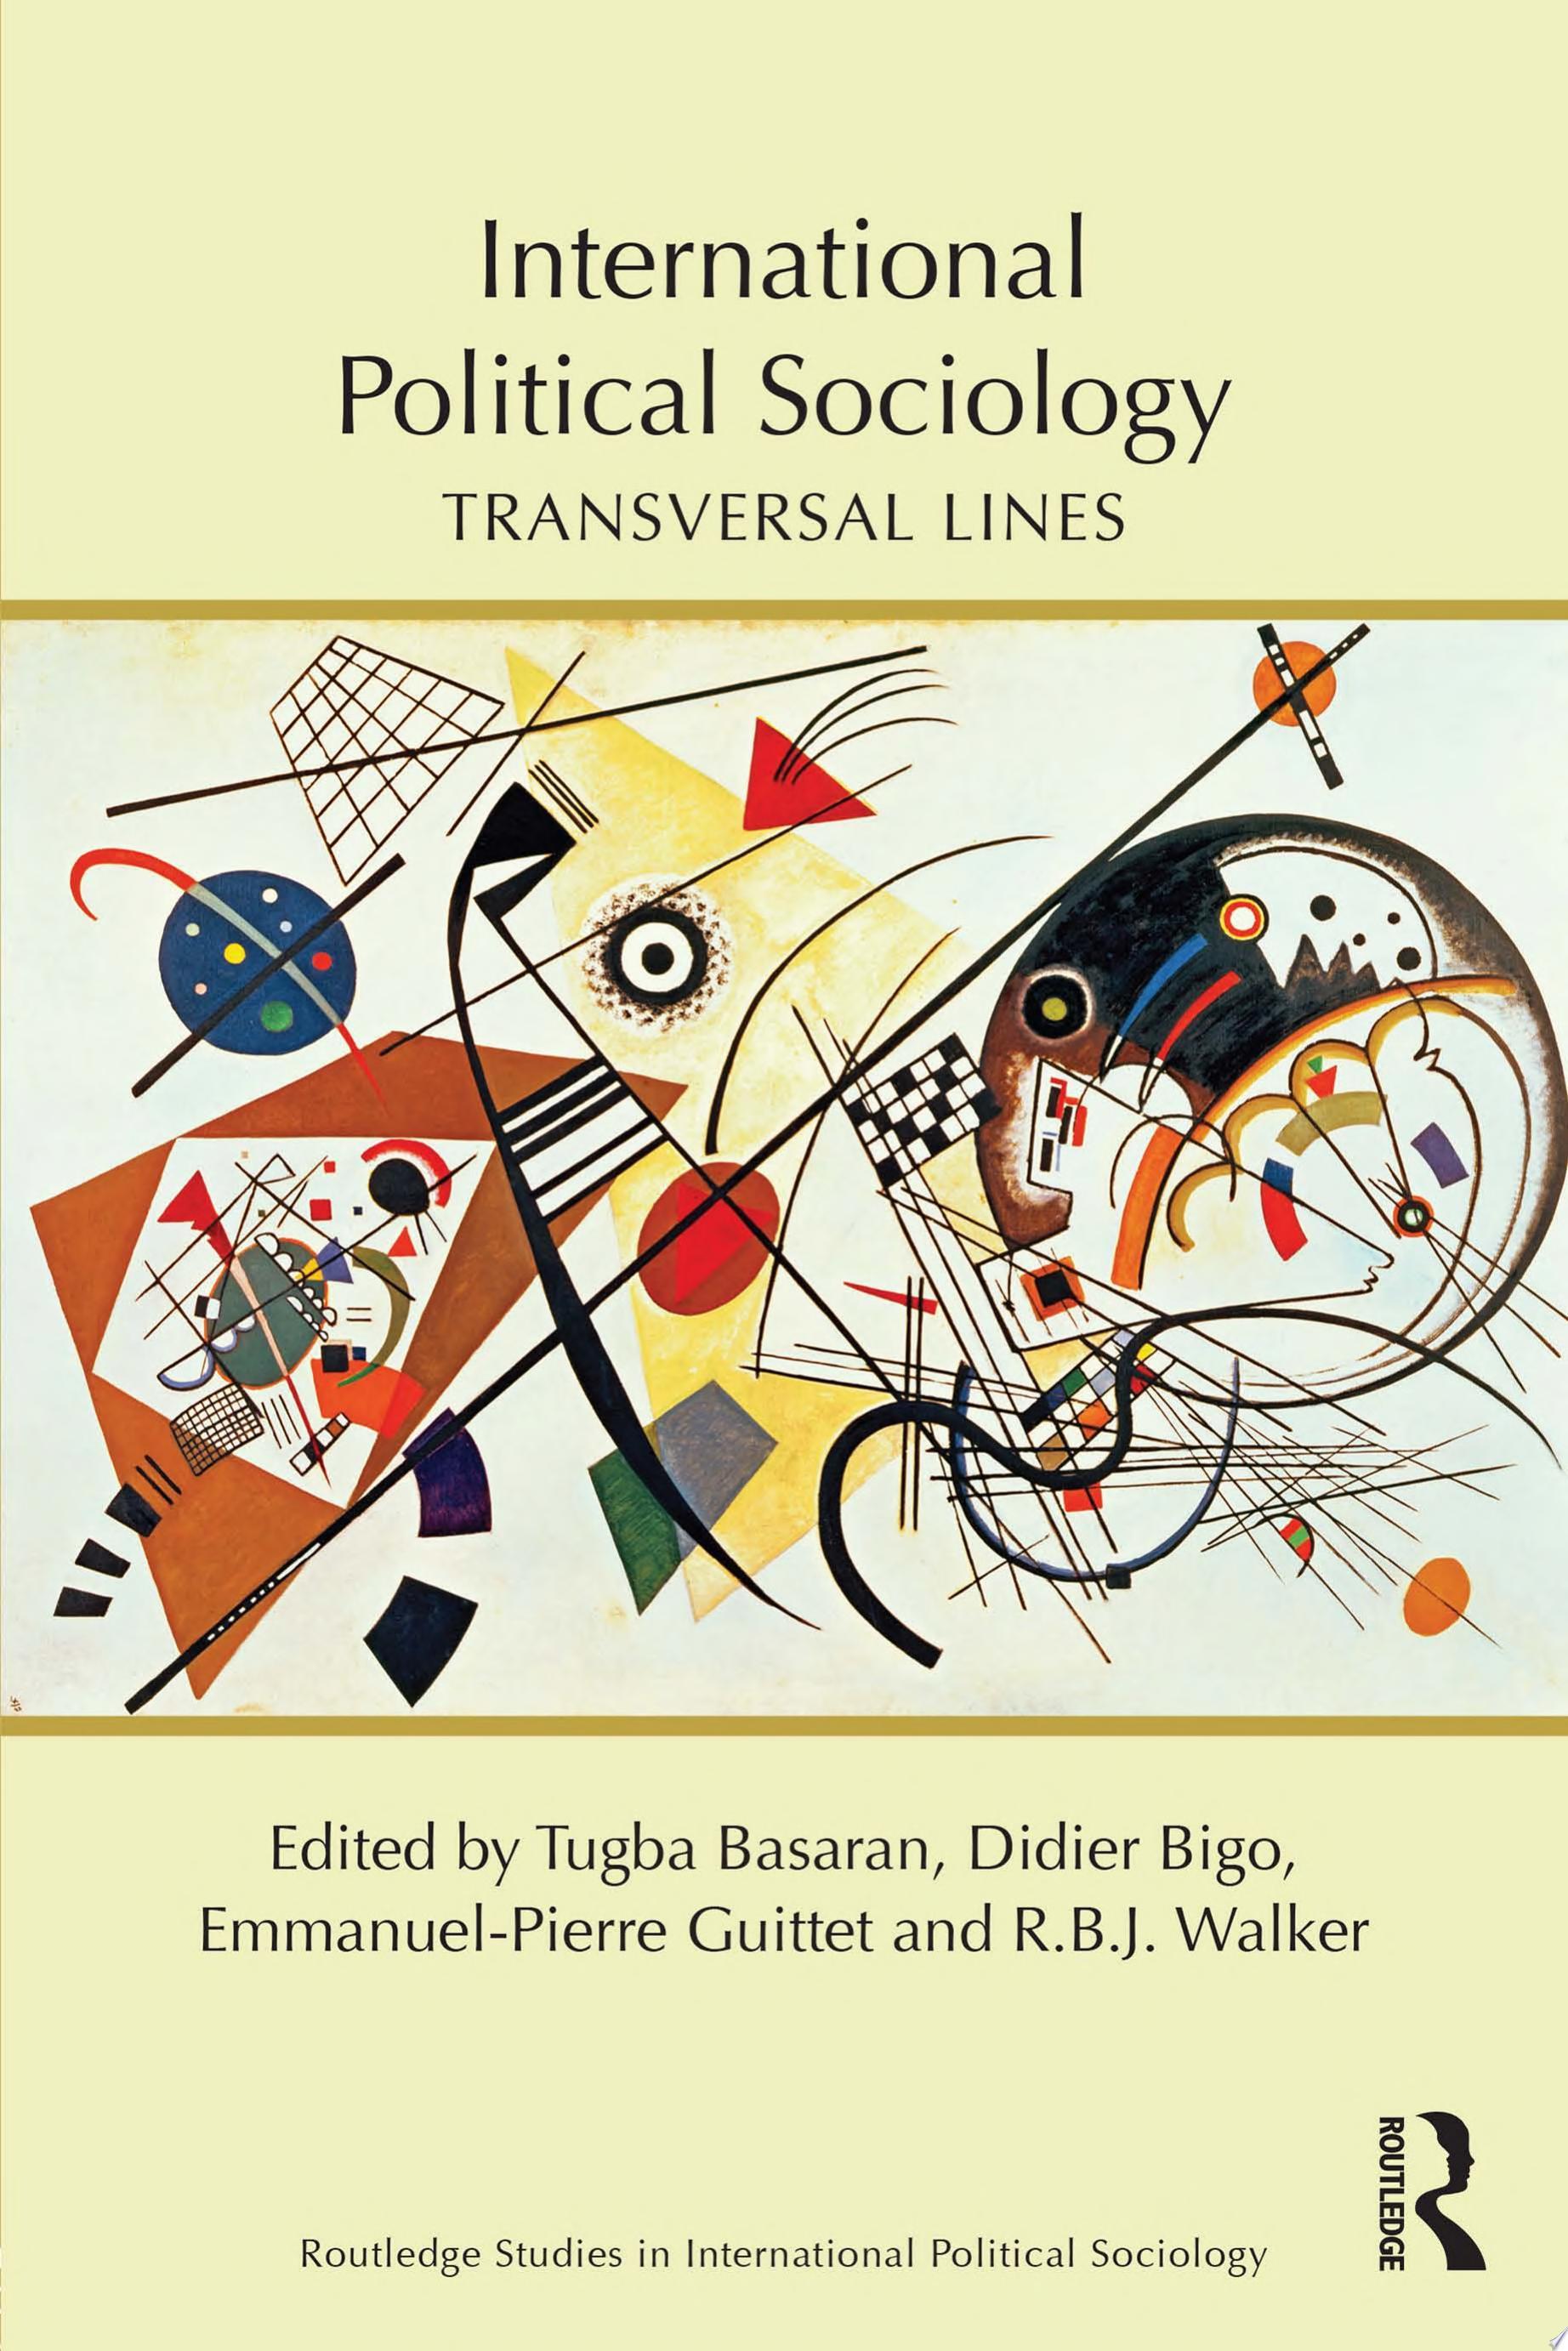 International Political Sociology